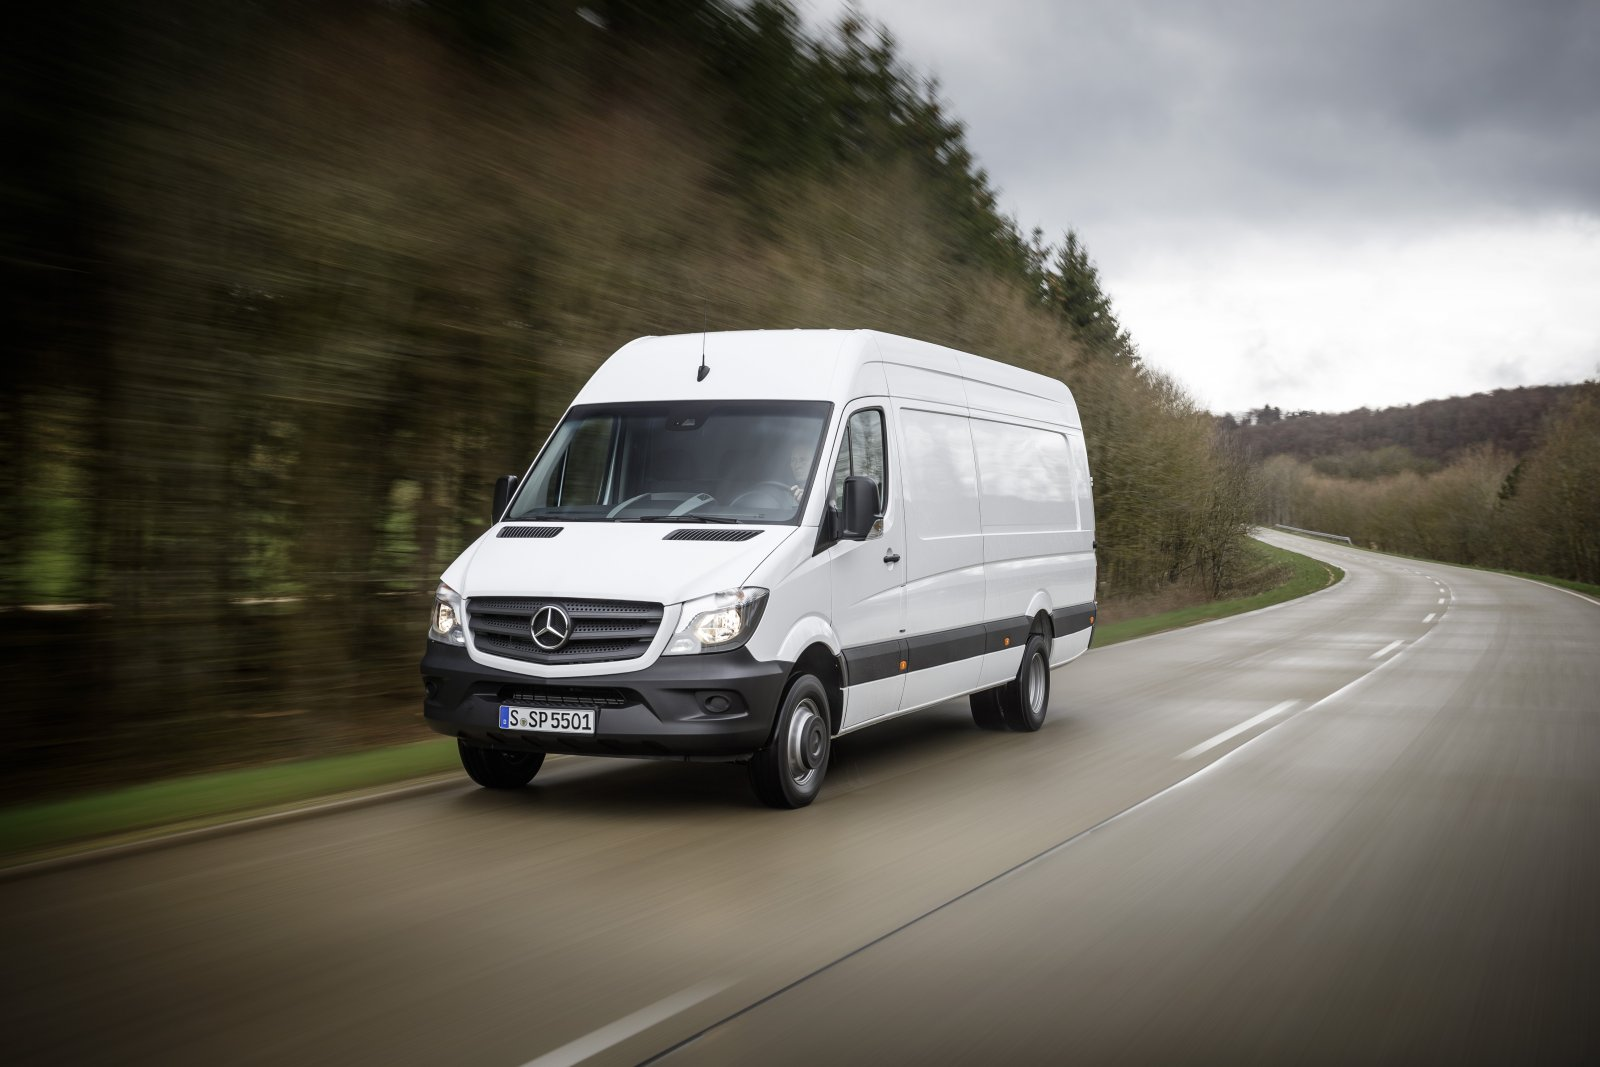 Mercedes-Benz Sprinter – 516 CDI; exteriör; Arktik vit; OM 651 motoreffekt 120 kW/163 hk; displacement 2.15 l; 6-växlad manuell växellåda Eco Gear; hjulbas: 4325 mm; totalvikt 5.5 ton